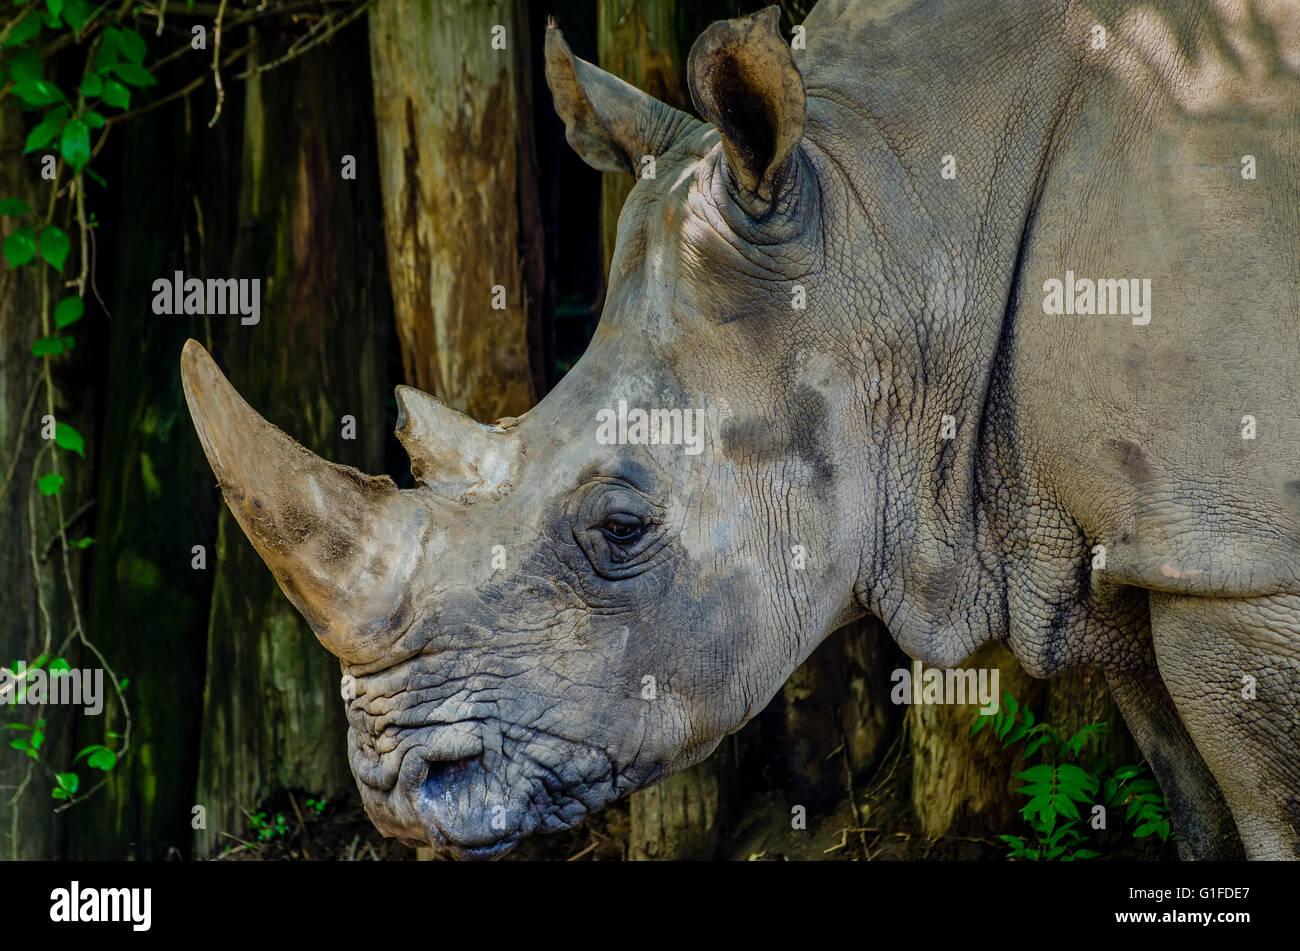 Rhino at the Louisville Kentucky Zoo - Stock Image